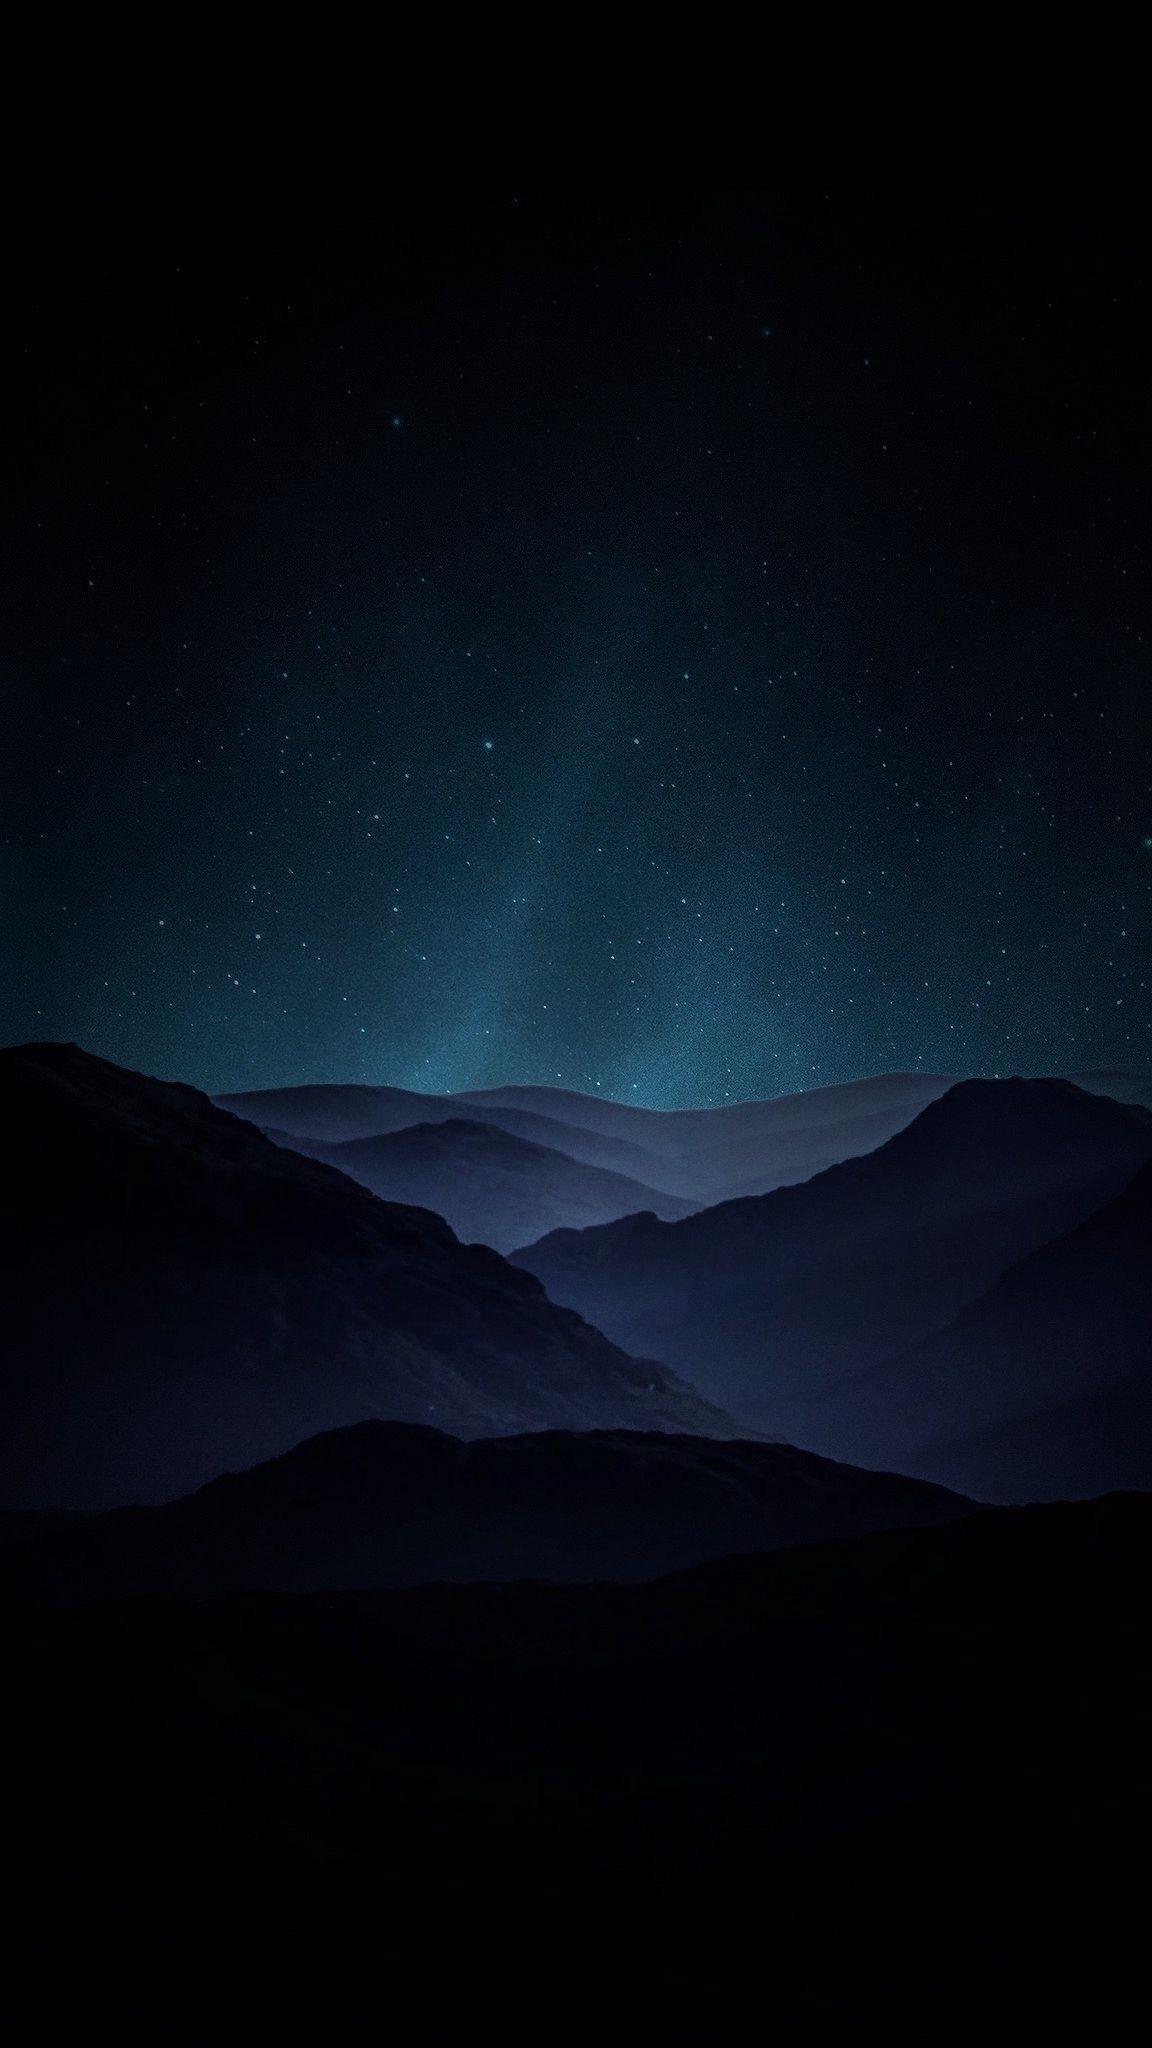 MOUNTAIN NIGHT MOUNTAINS LANDSCAPE STARS SKY